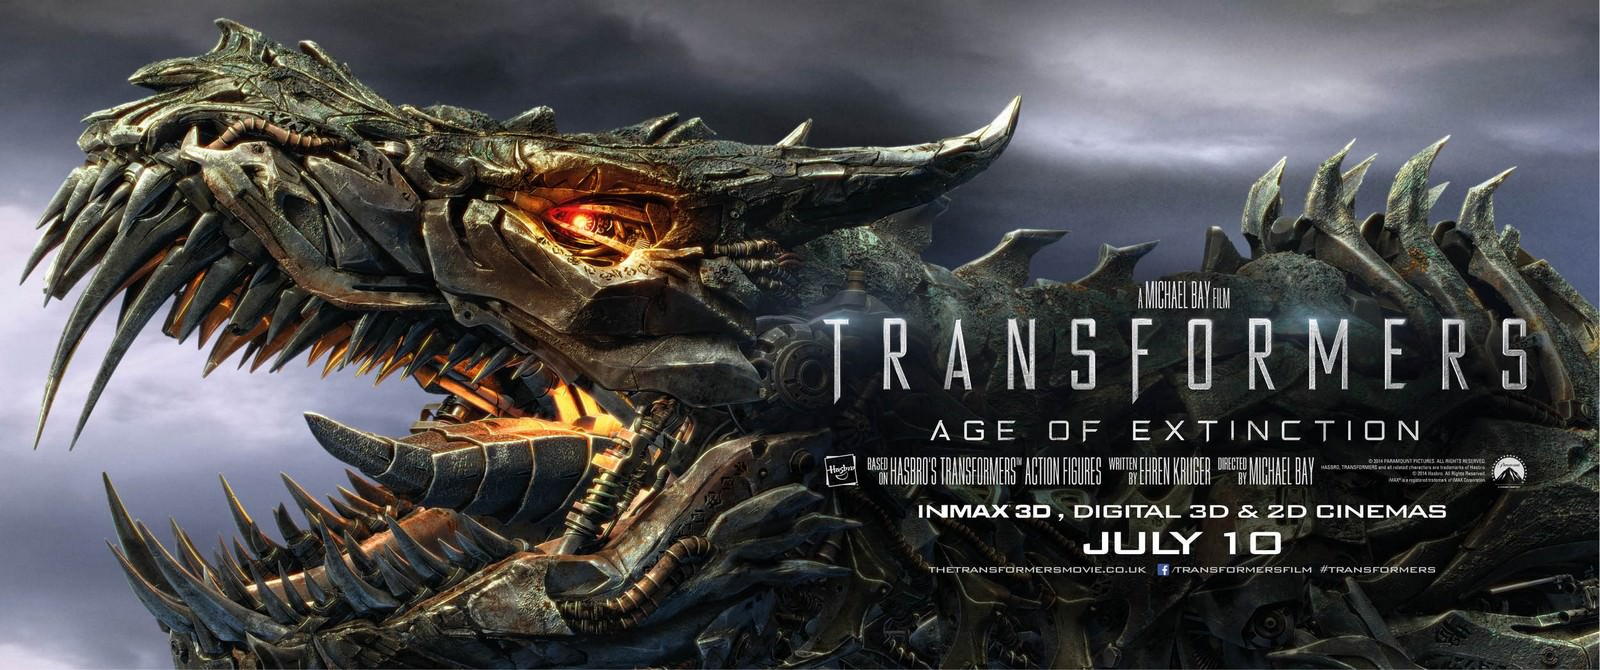 Movie, Transformers: Age of Extinction(美國, 2014年) / 變形金剛4:絕跡重生(台灣) / 变形金刚4:绝迹重生(中國) / 變形金剛:殲滅世紀(香港), 電影海報, 美國, 橫版